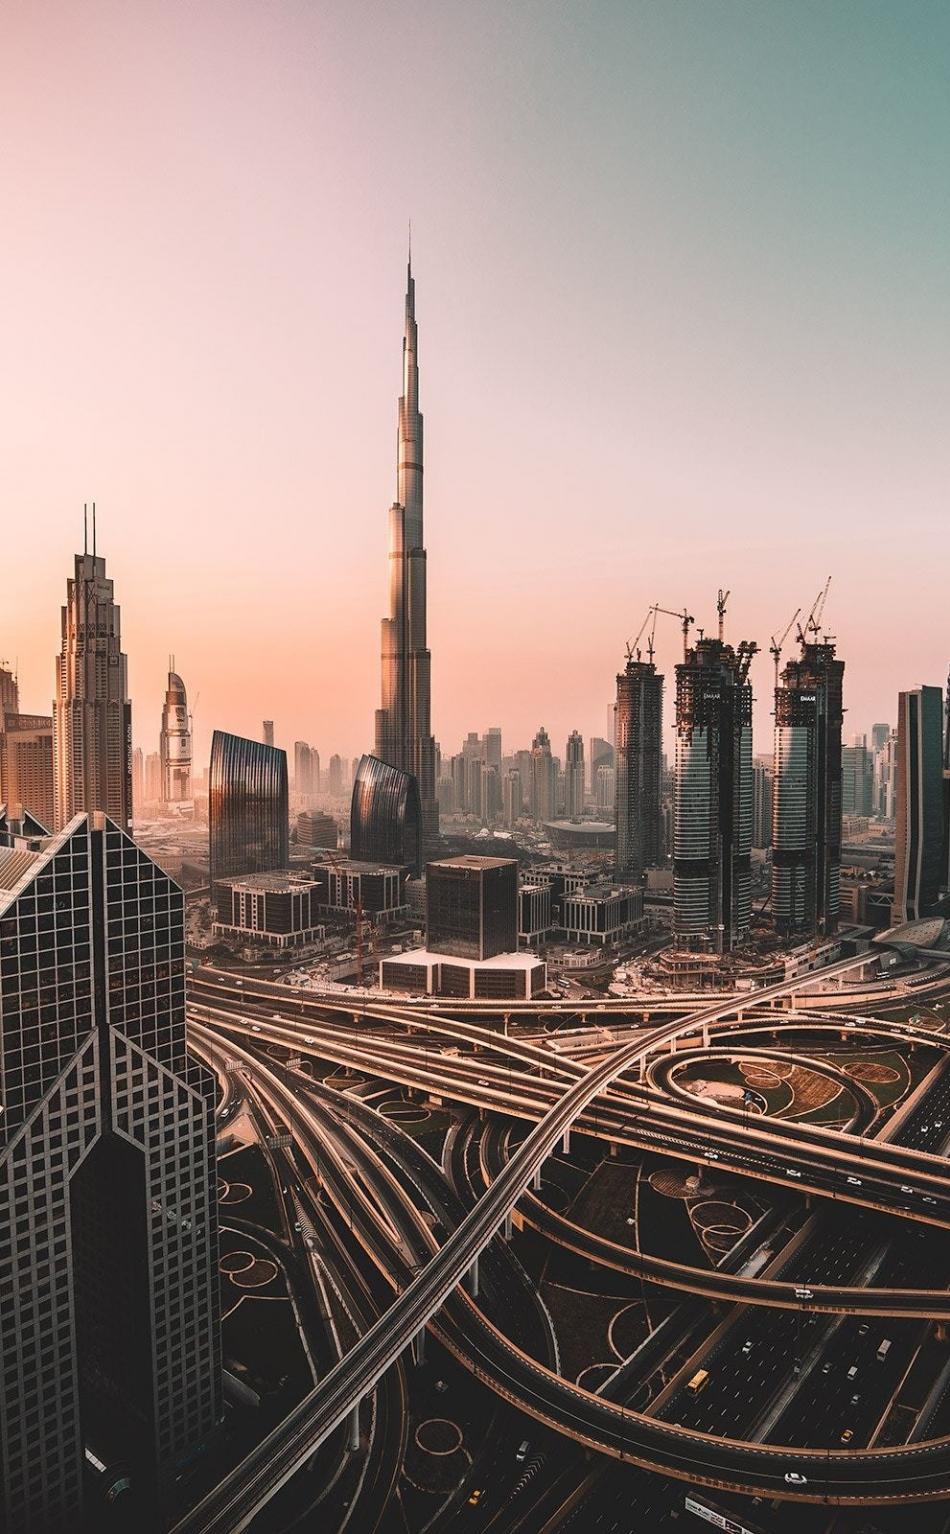 Dubai, skyline, cityscape, skyscrapers, buildings, Burj Khalifa, city, 950x1534 wallpaper